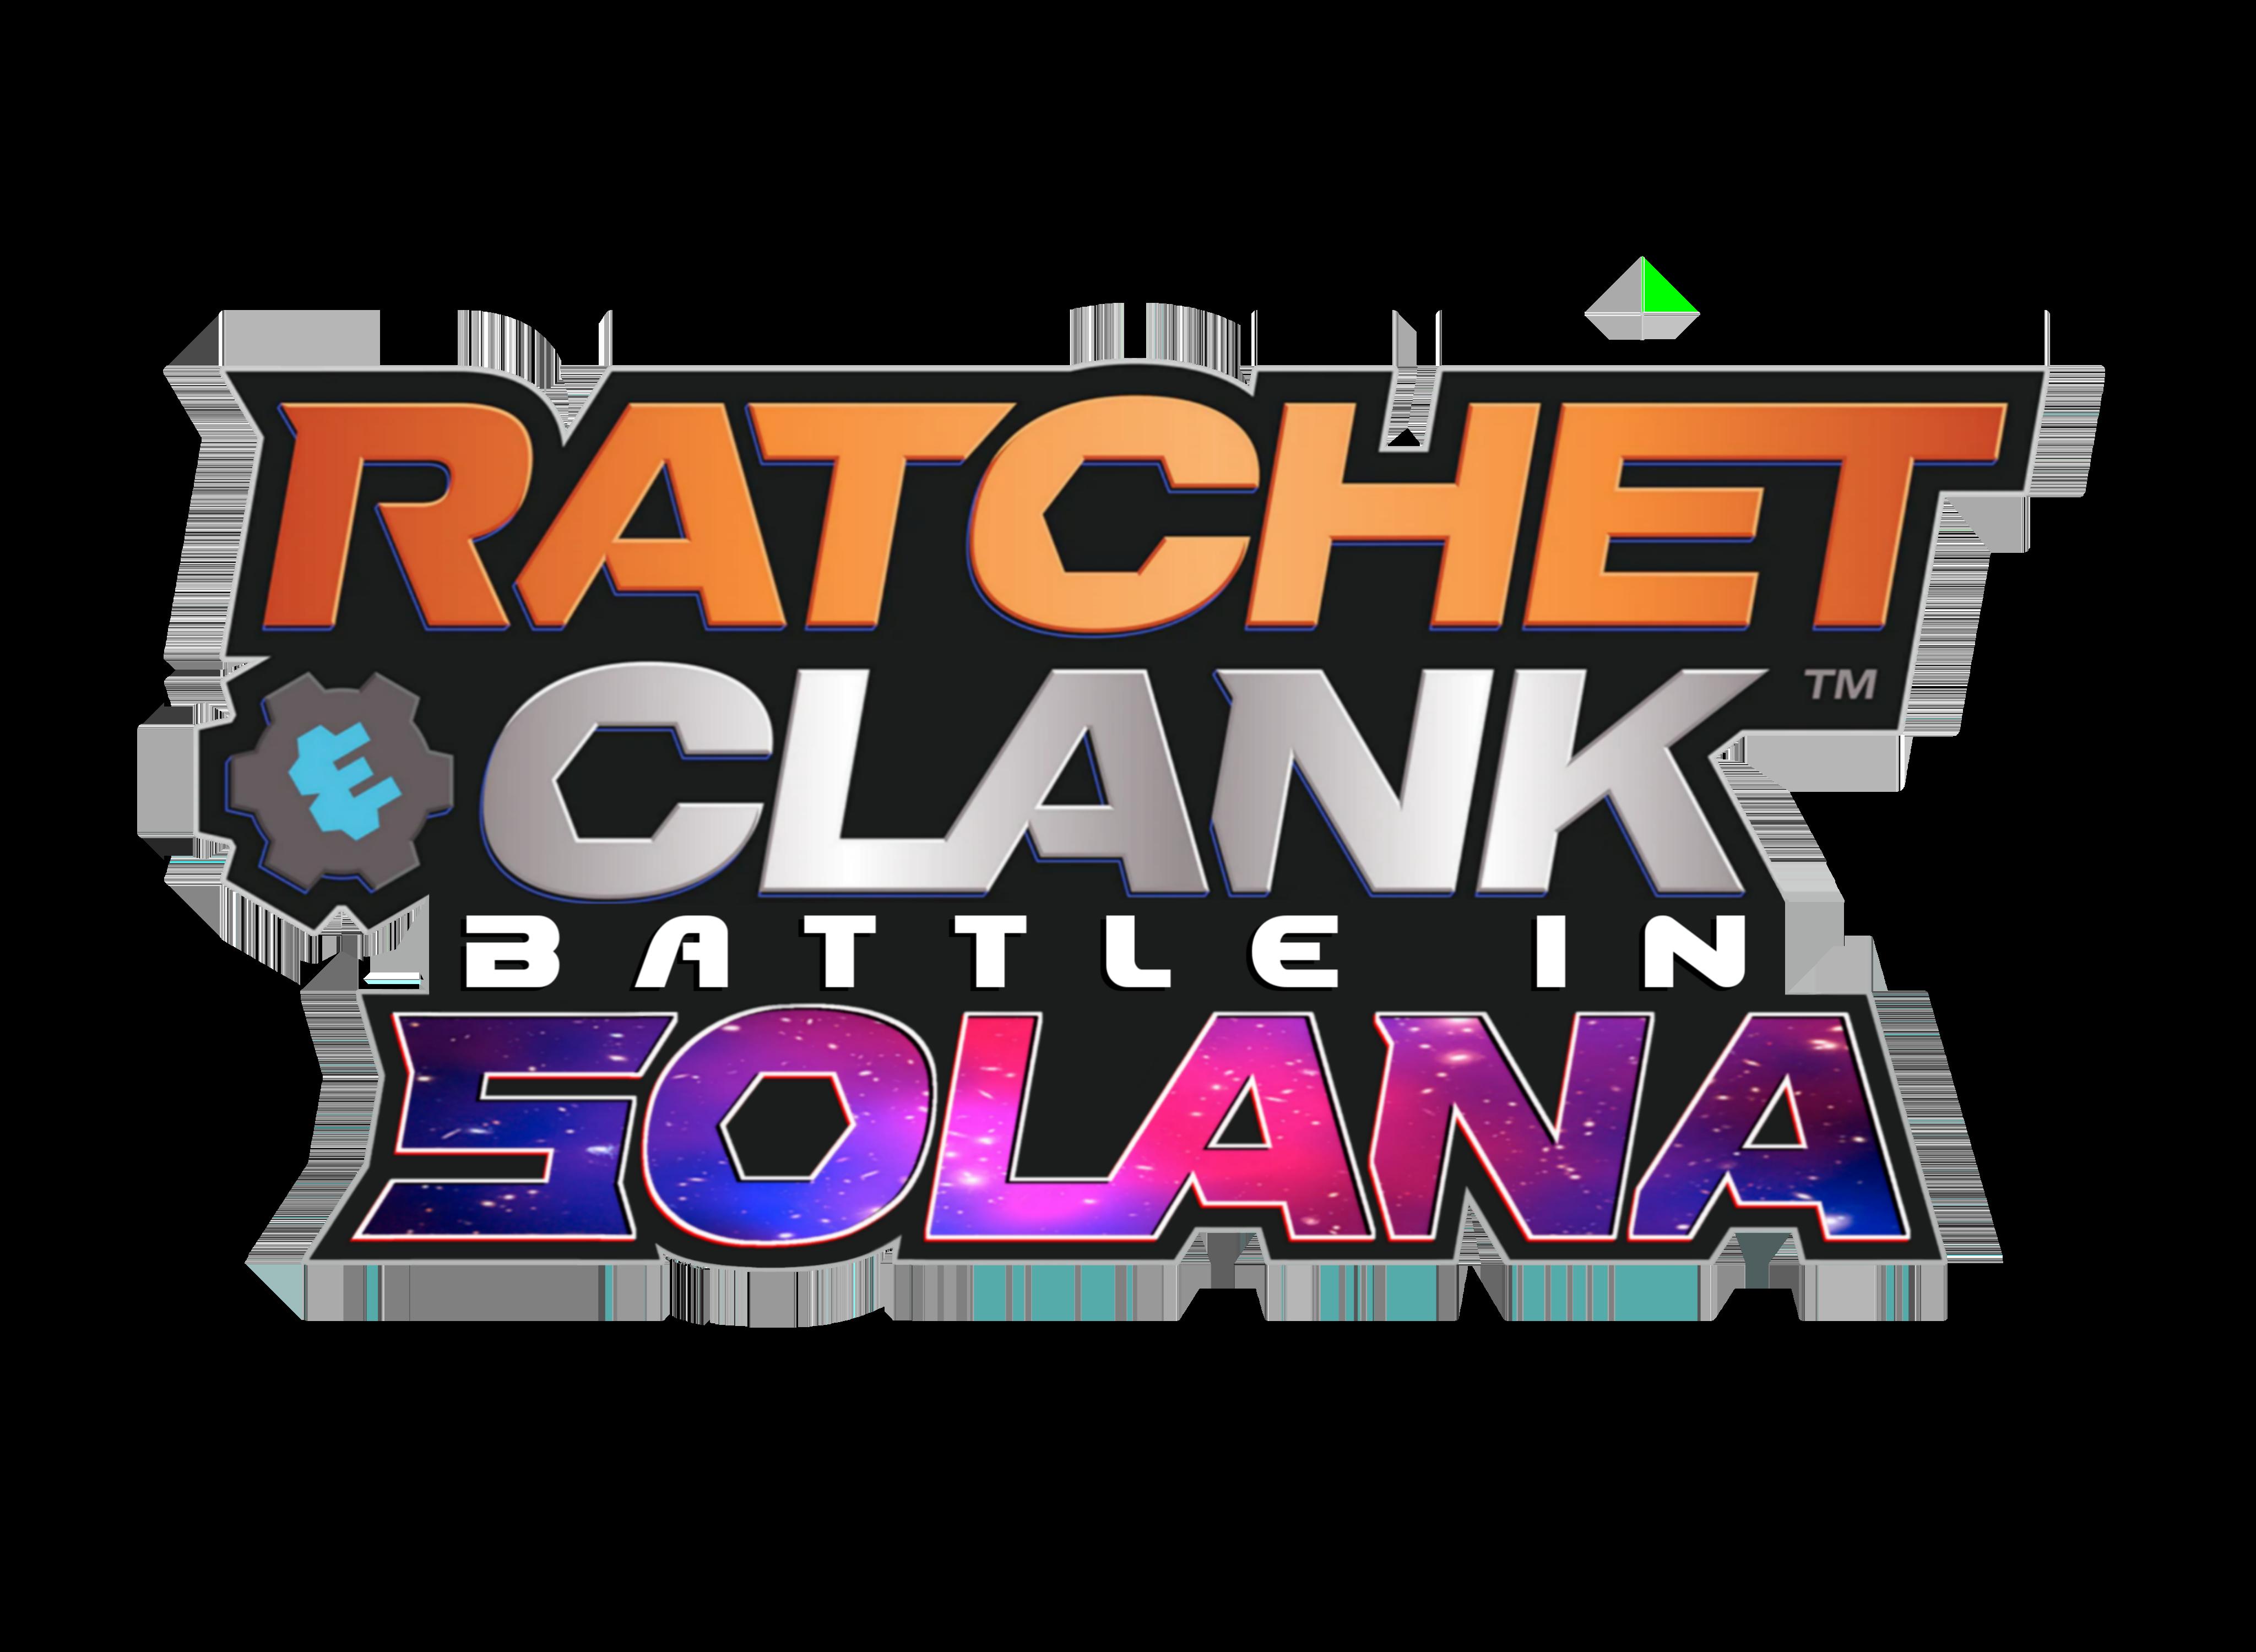 Logo de Ratchet & Clank: Battle in Solana, designé CROCO.